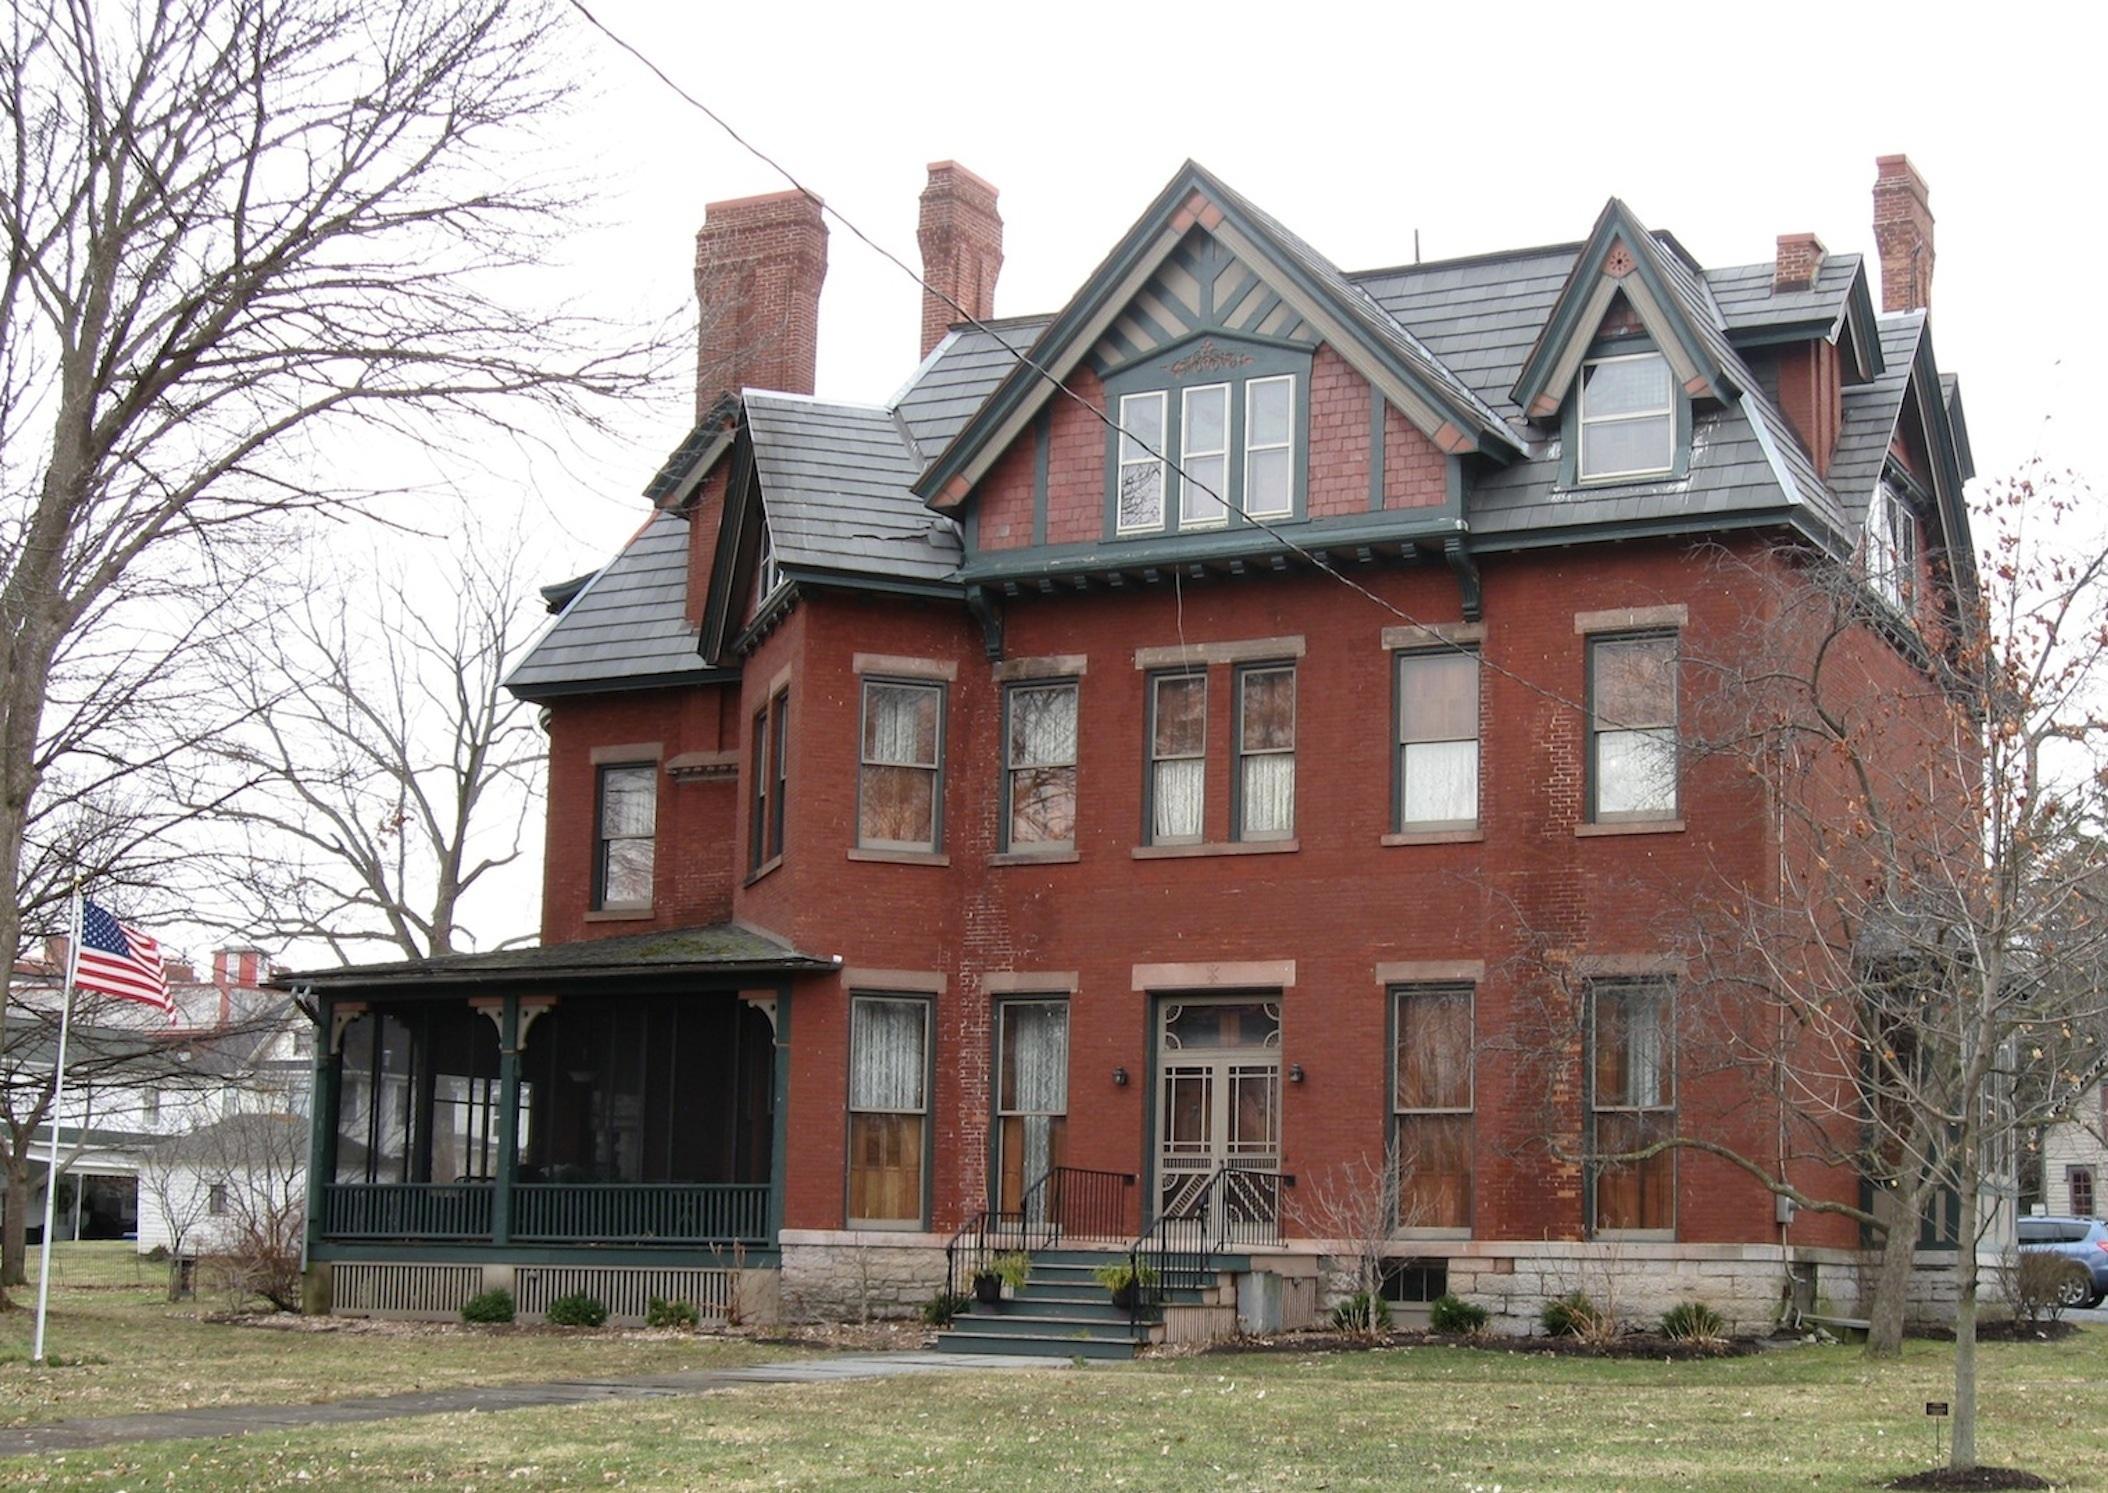 Seneca Falls Historical Society, The Mynderse/Partridge/Becker House